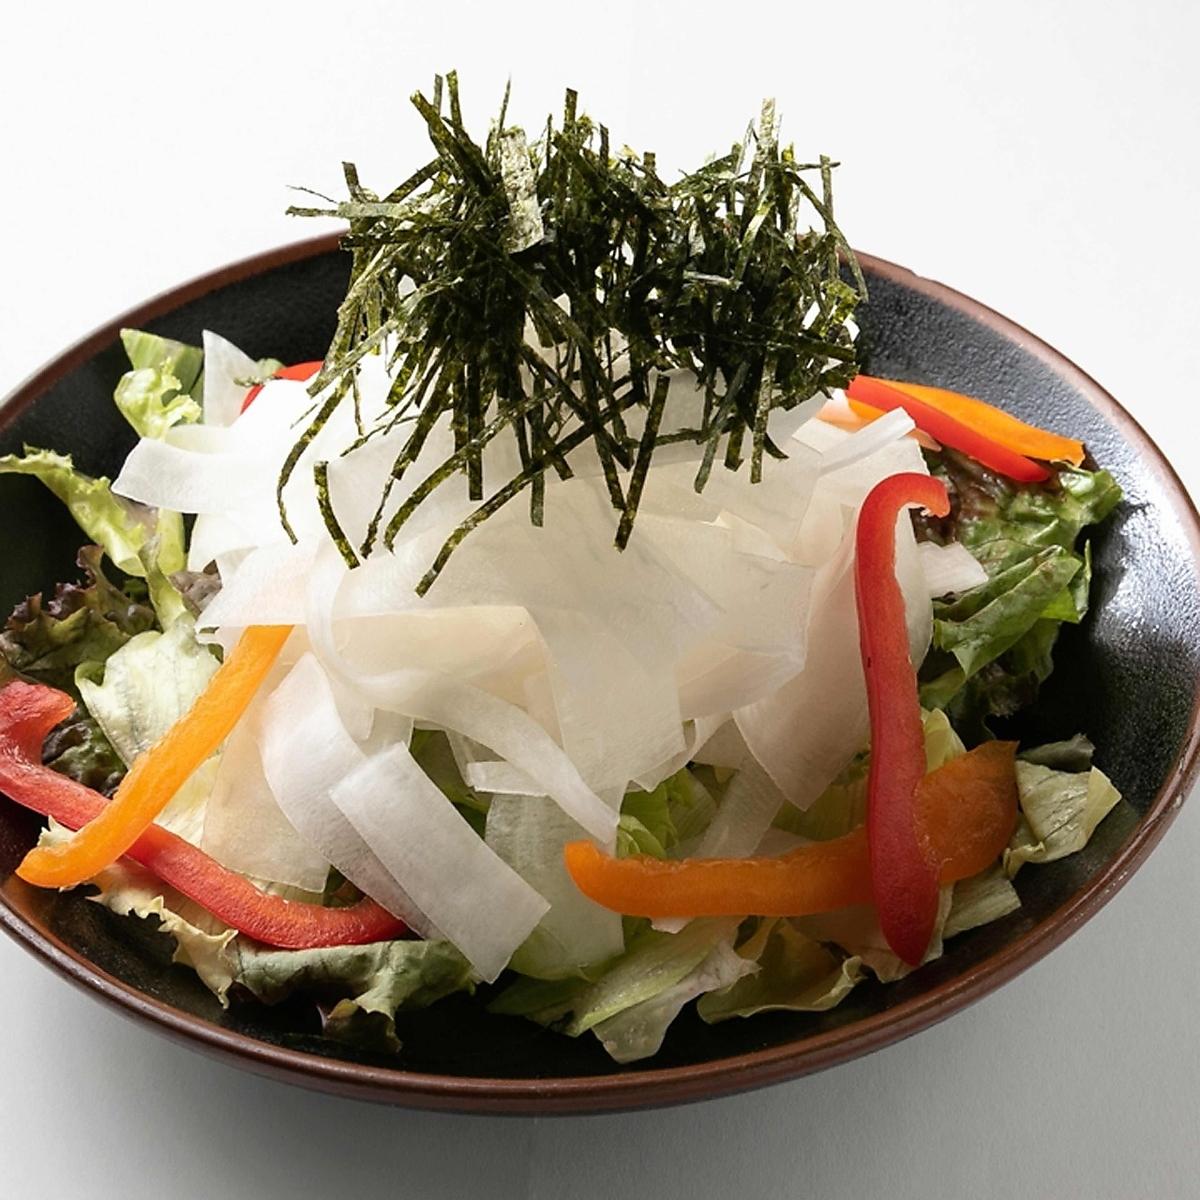 Gachi盛蘿蔔沙拉